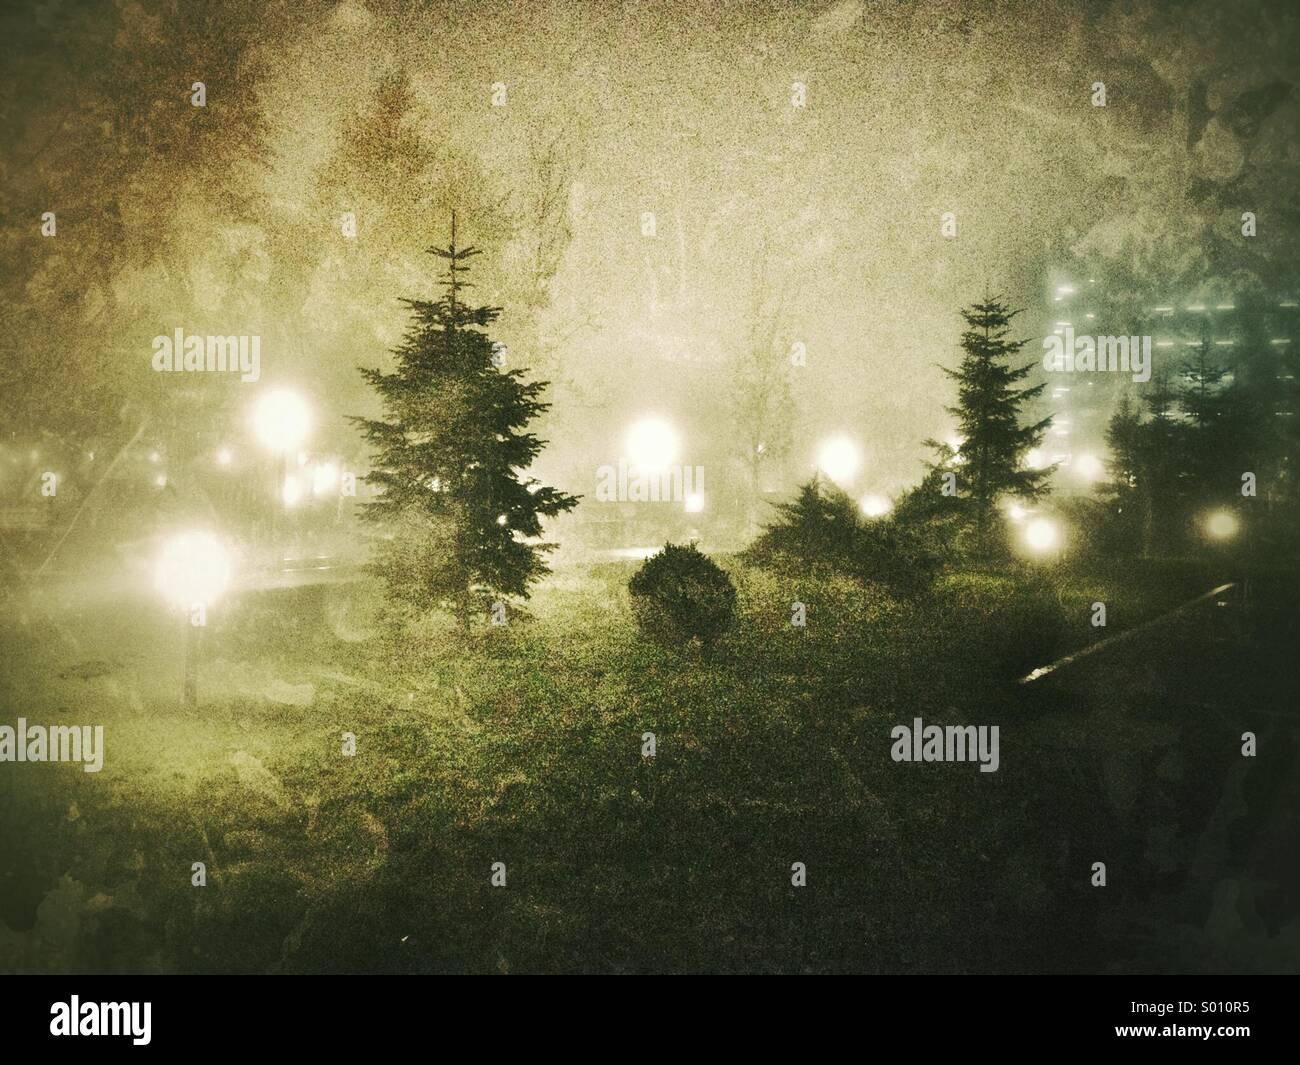 Nacht und Nebel Stockbild